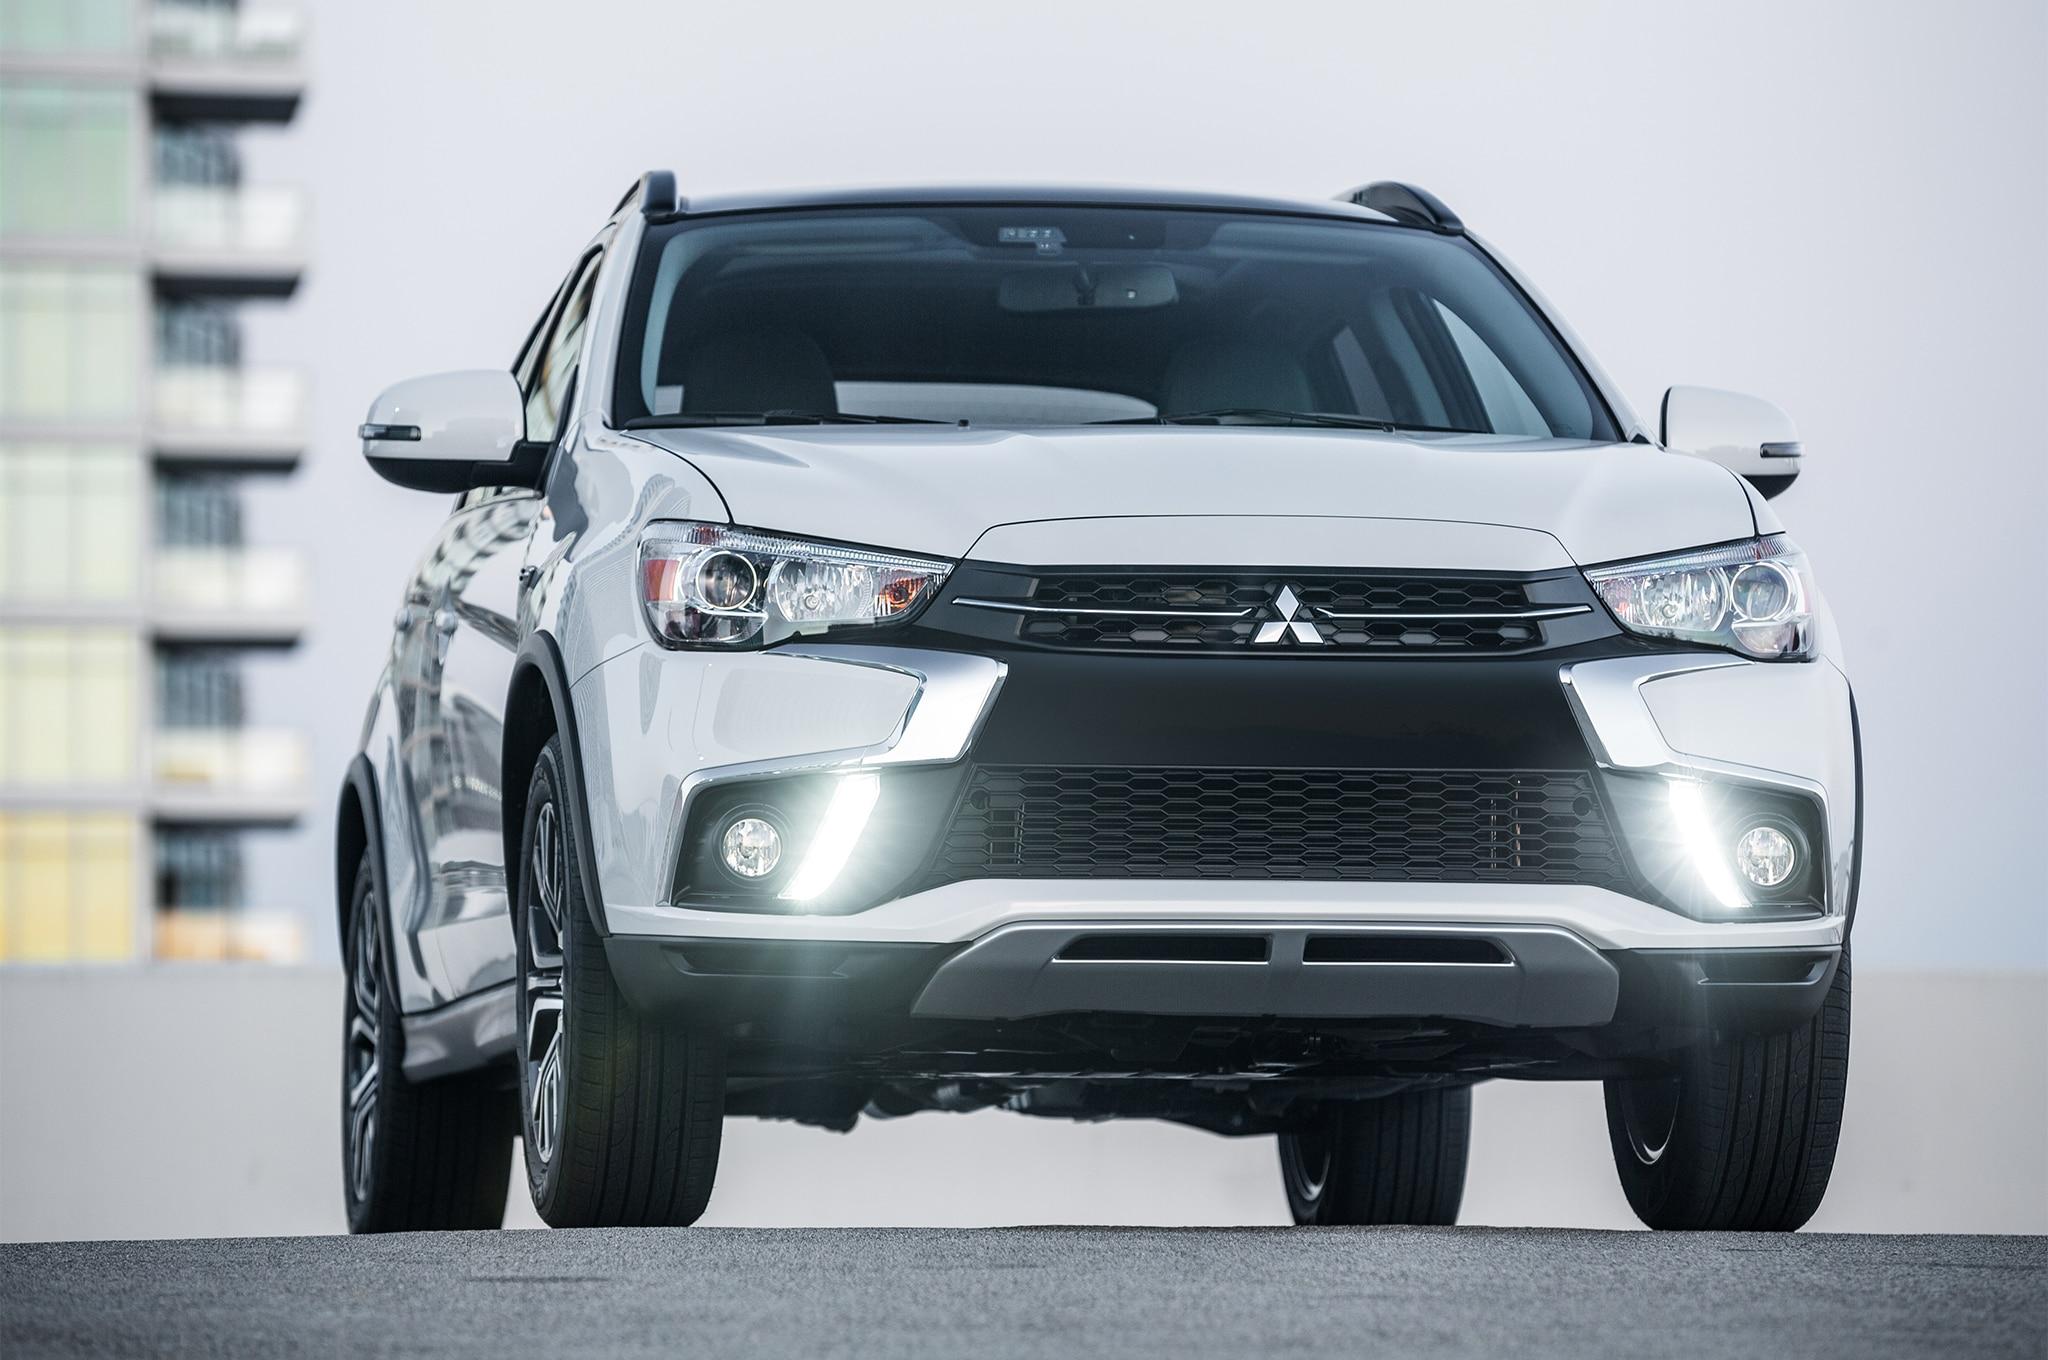 2018 Mitsubishi Outlander Sport Front View